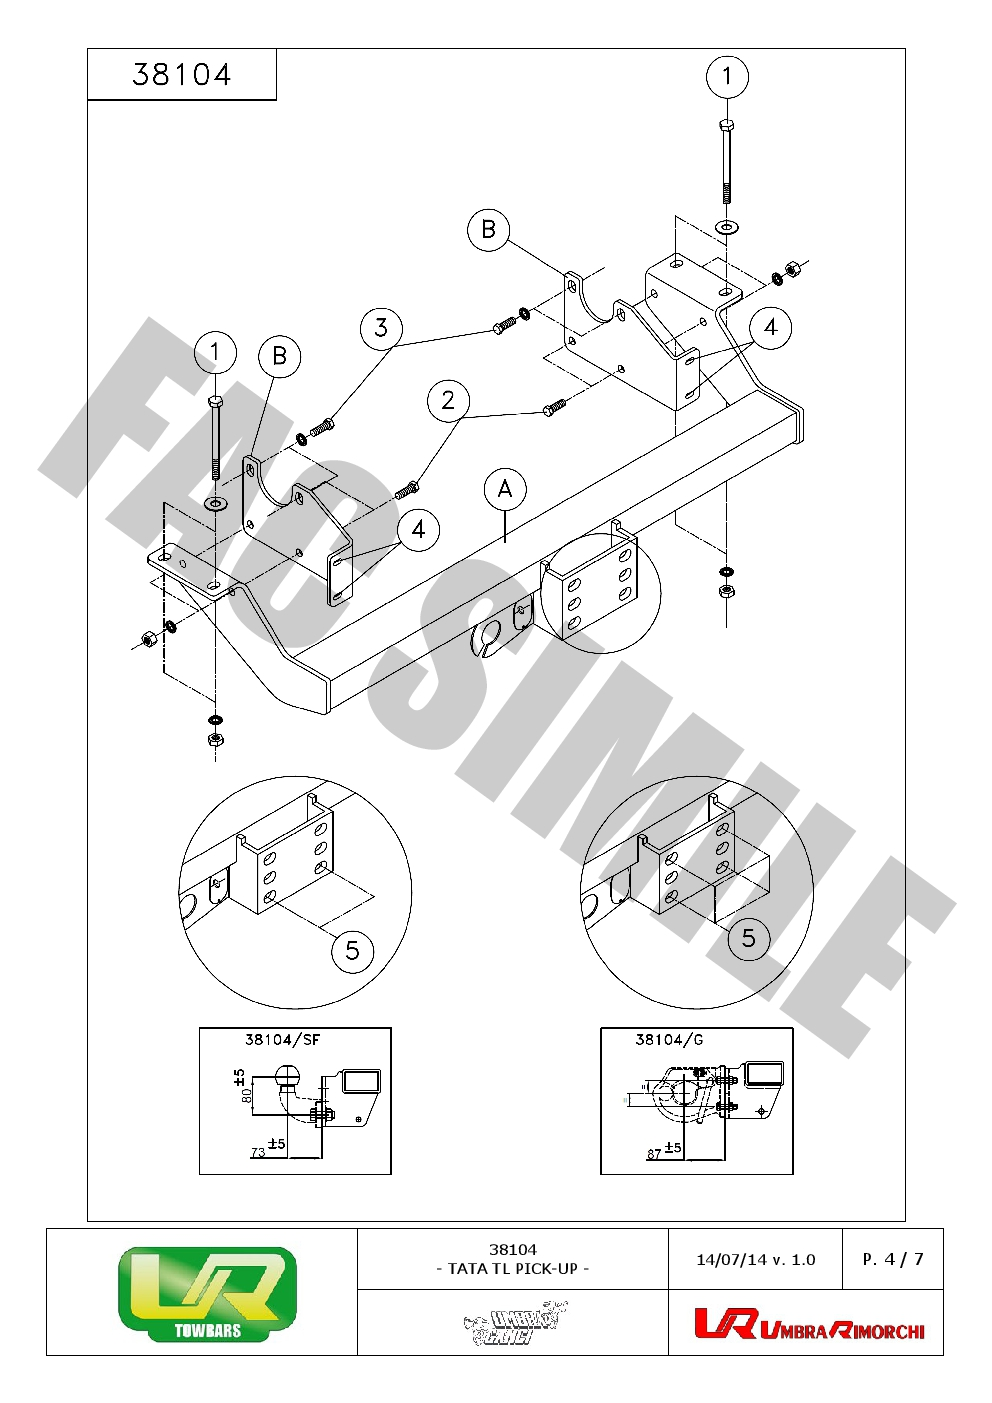 fixed flange towbar manual fit new car tow bar for tata van 38104  sf c1